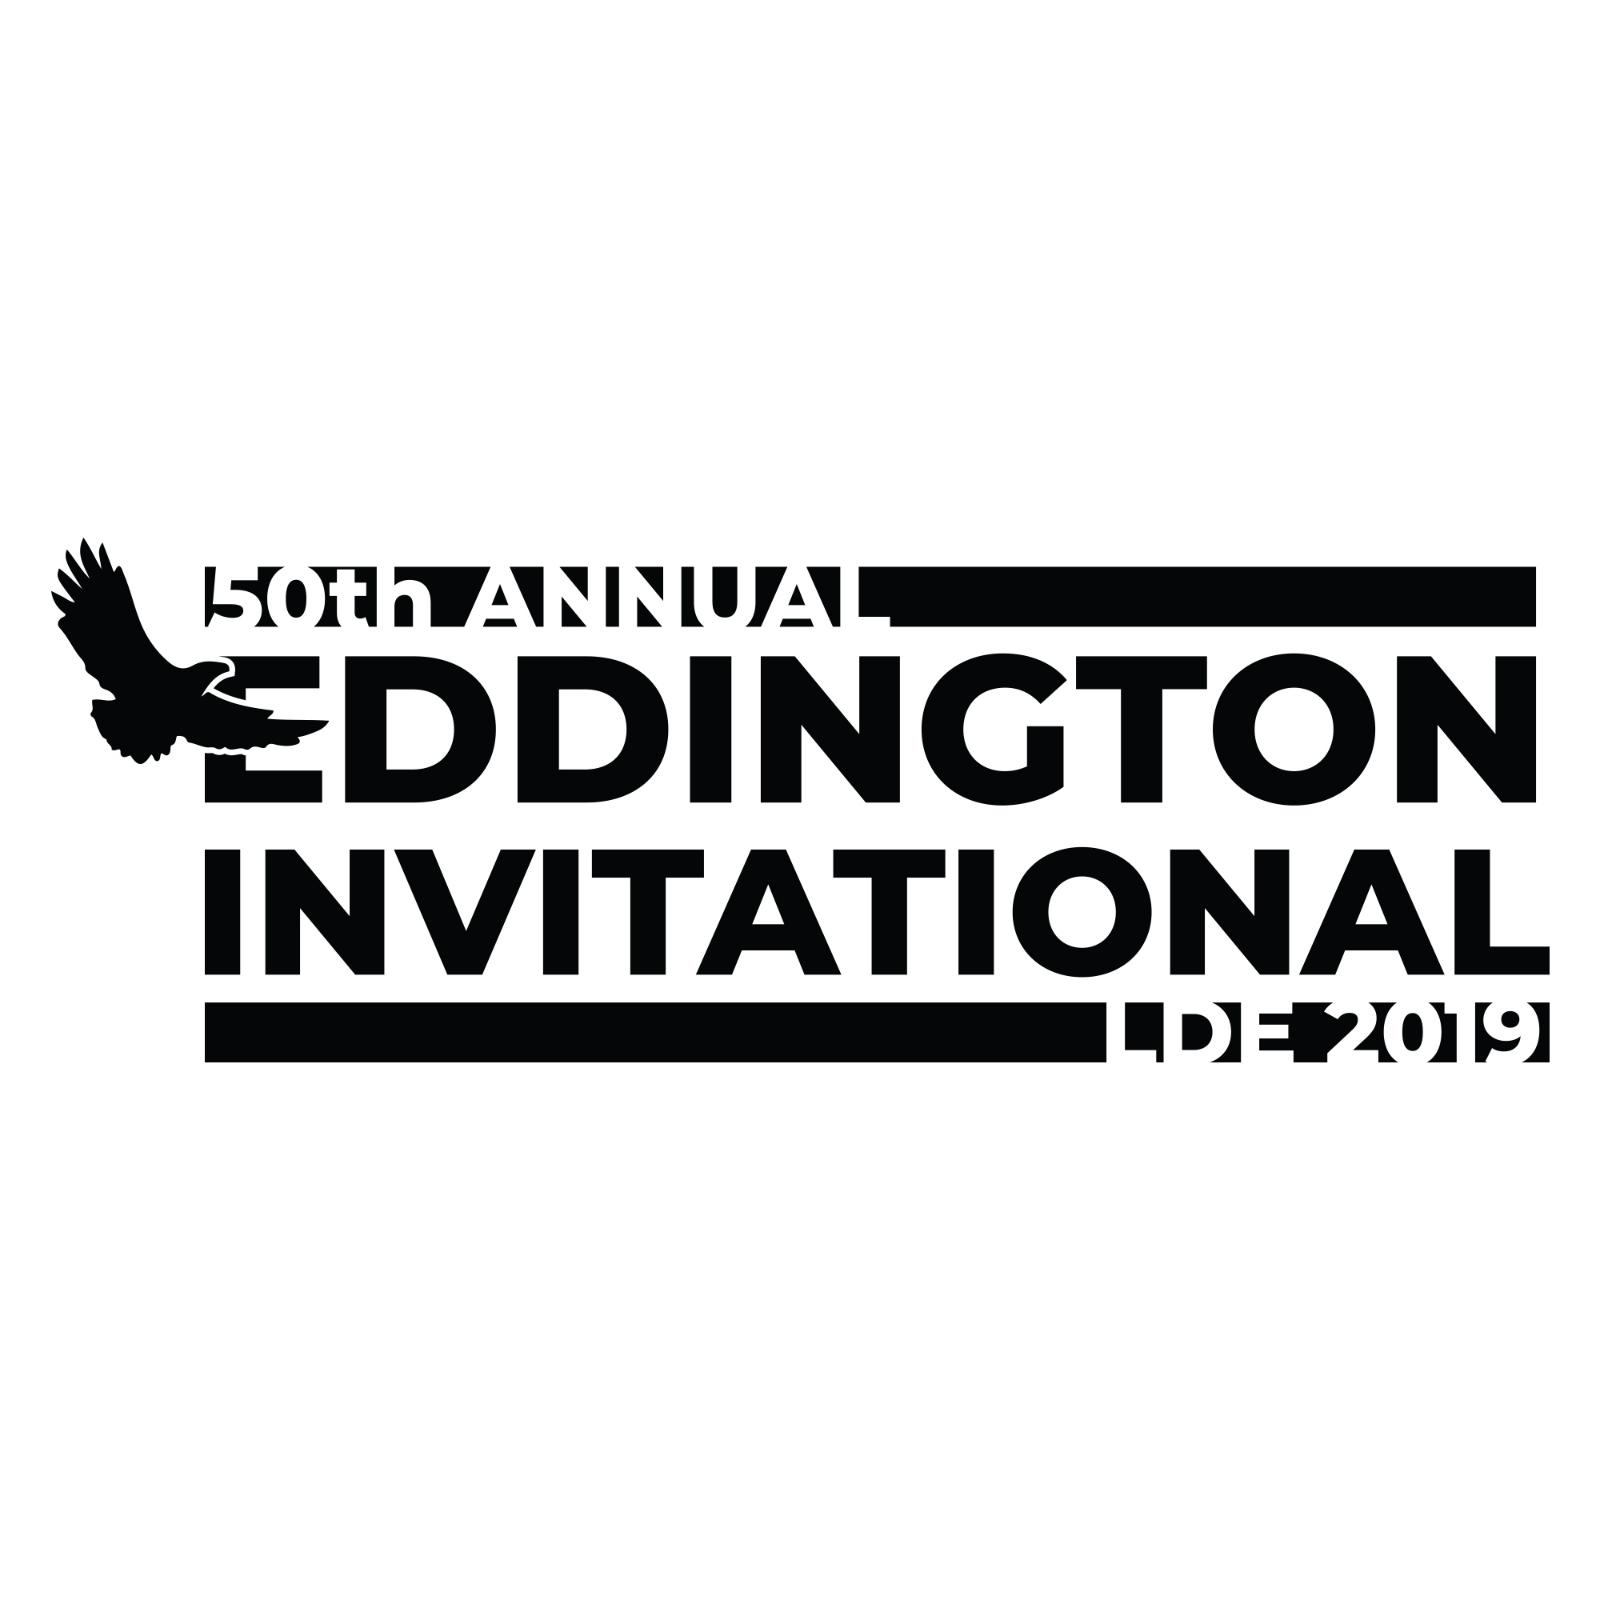 50th Annual Larry Eddington Cross Country Invitational